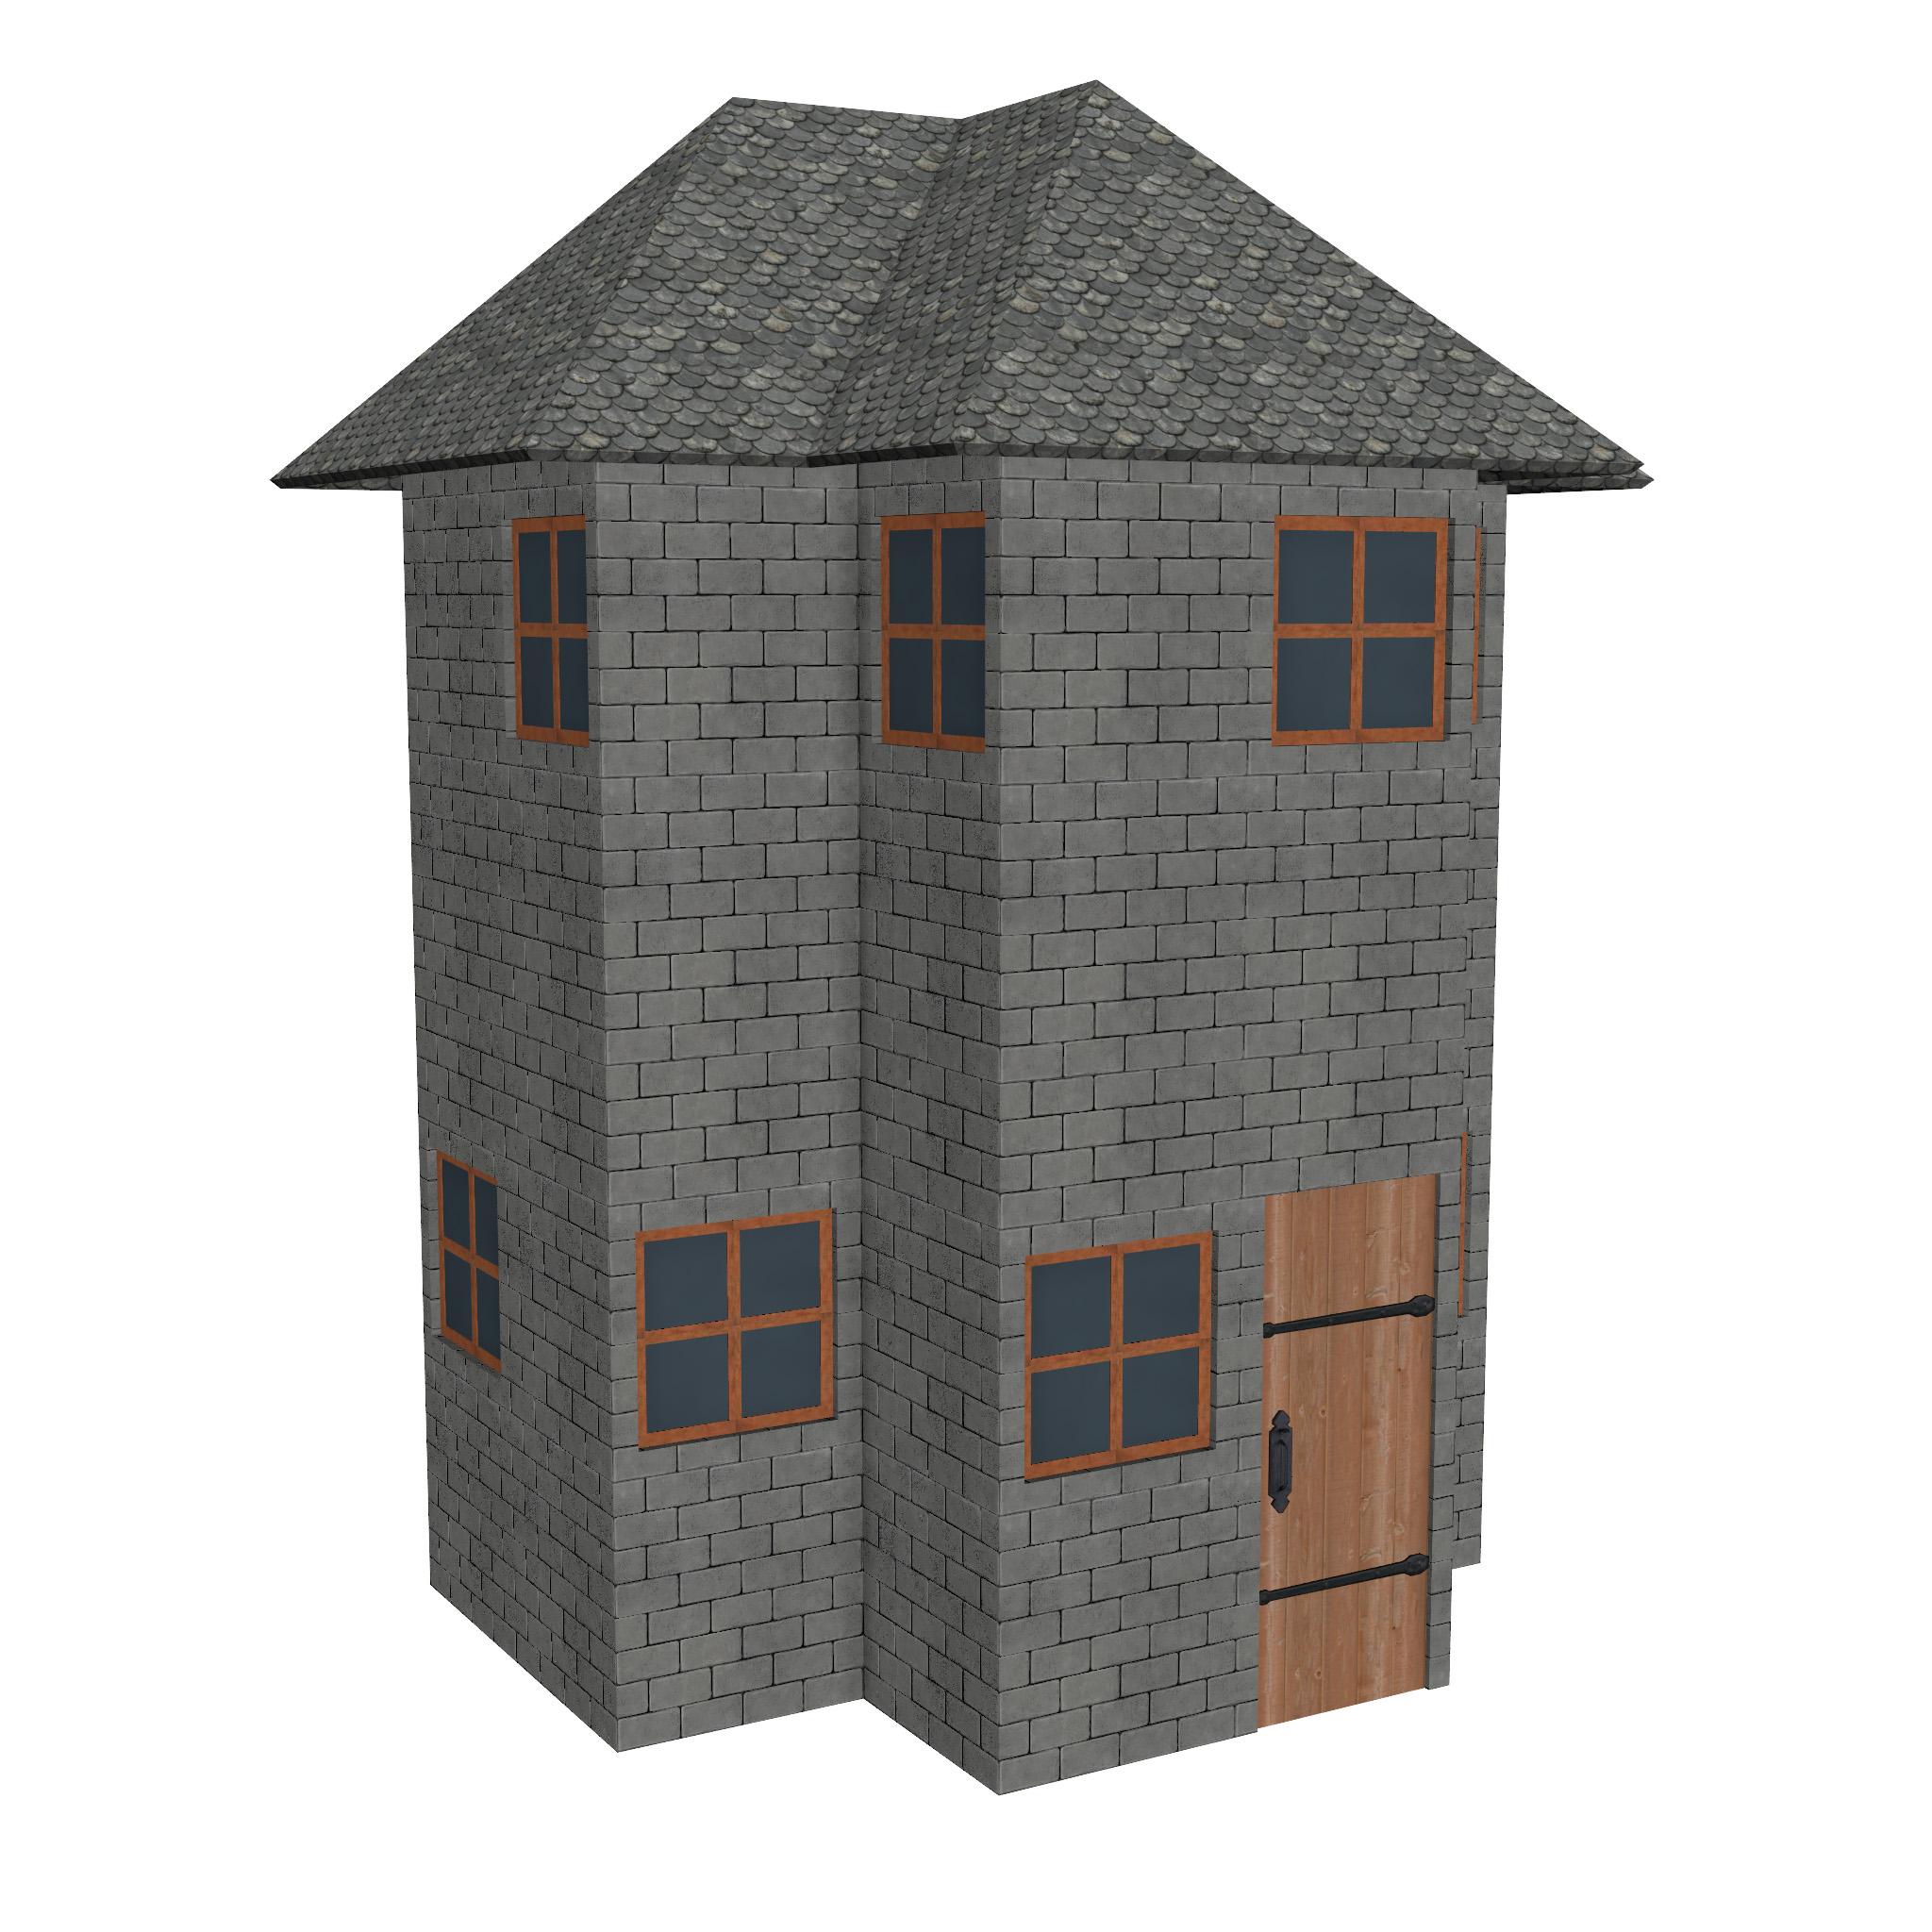 modular brick house set 3d model fbx ma mb 271408